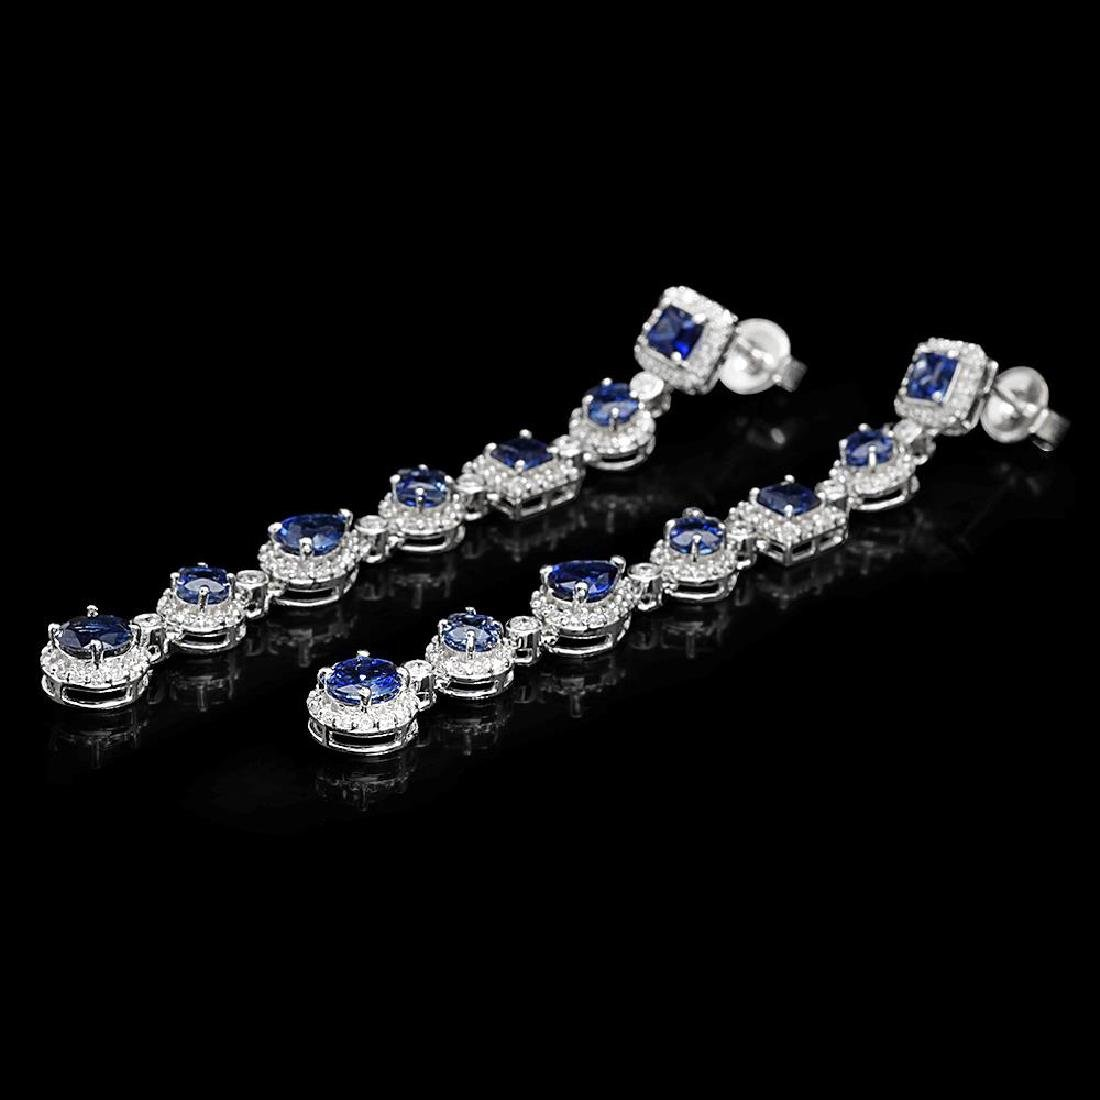 18K Gold 6.39ct Sapphire 2.87ct Diamond Earrings - 2